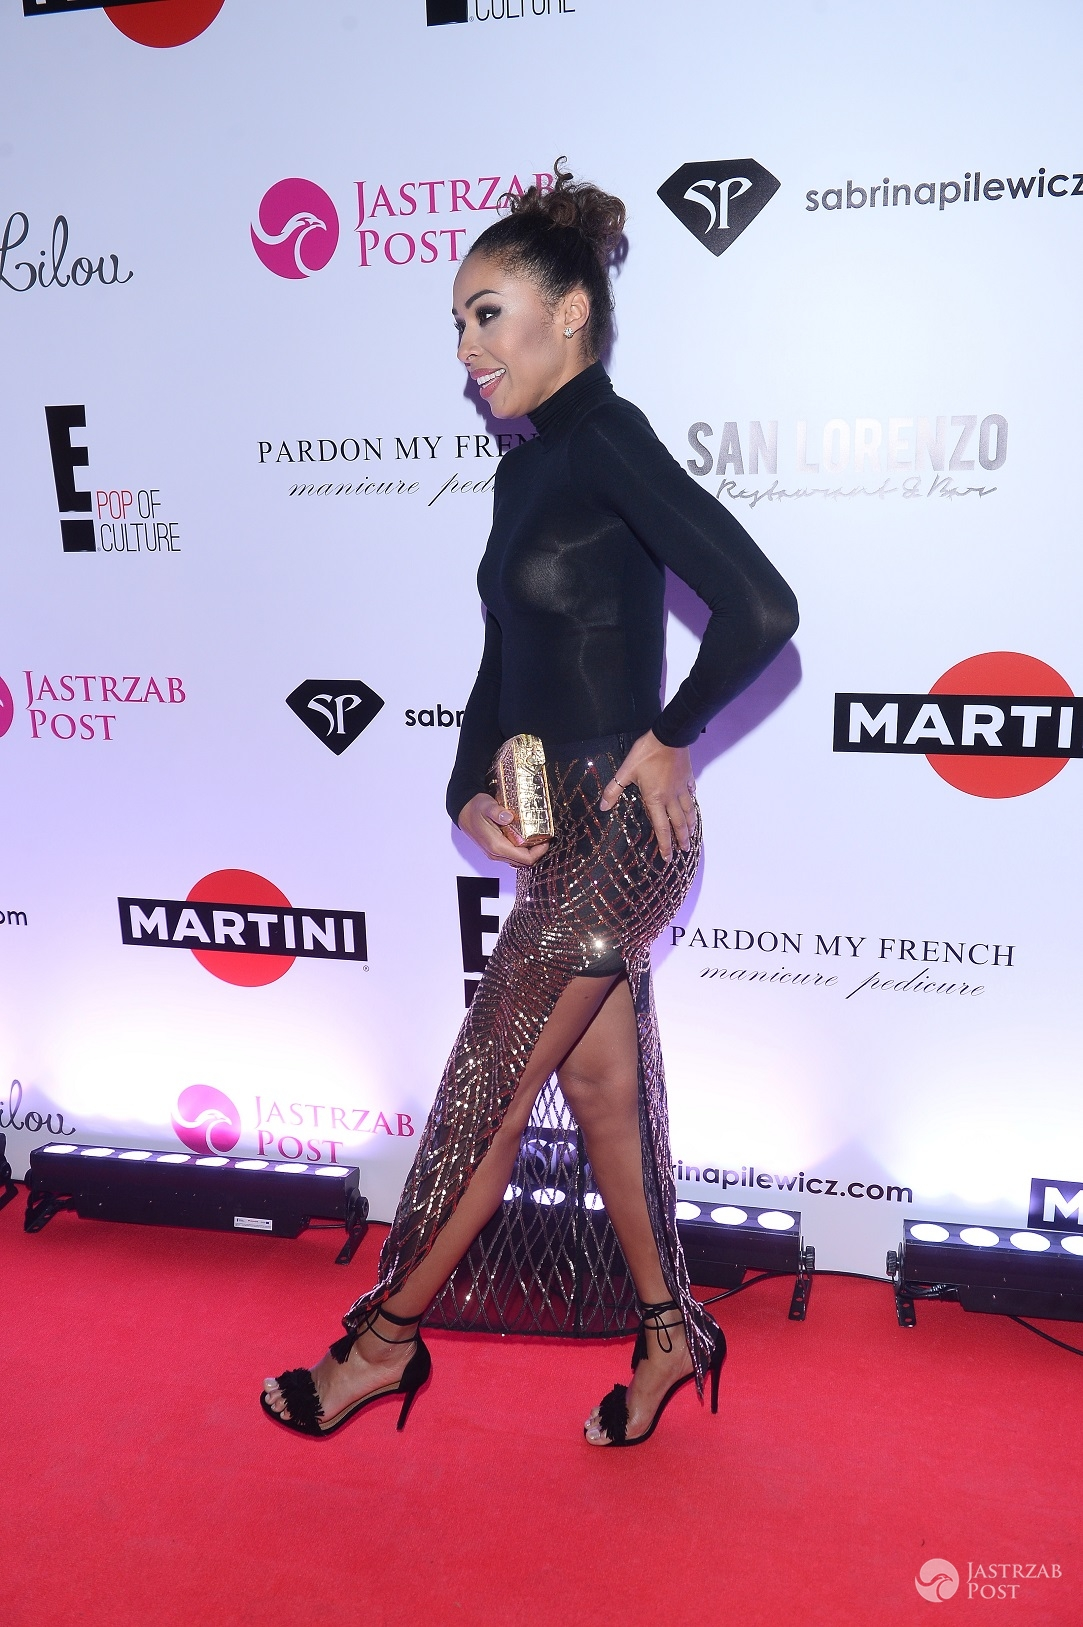 aOmenaa Mensah - Impreza oskarowa 2016 z E! Entertainment, Martini i Jastrząb Post